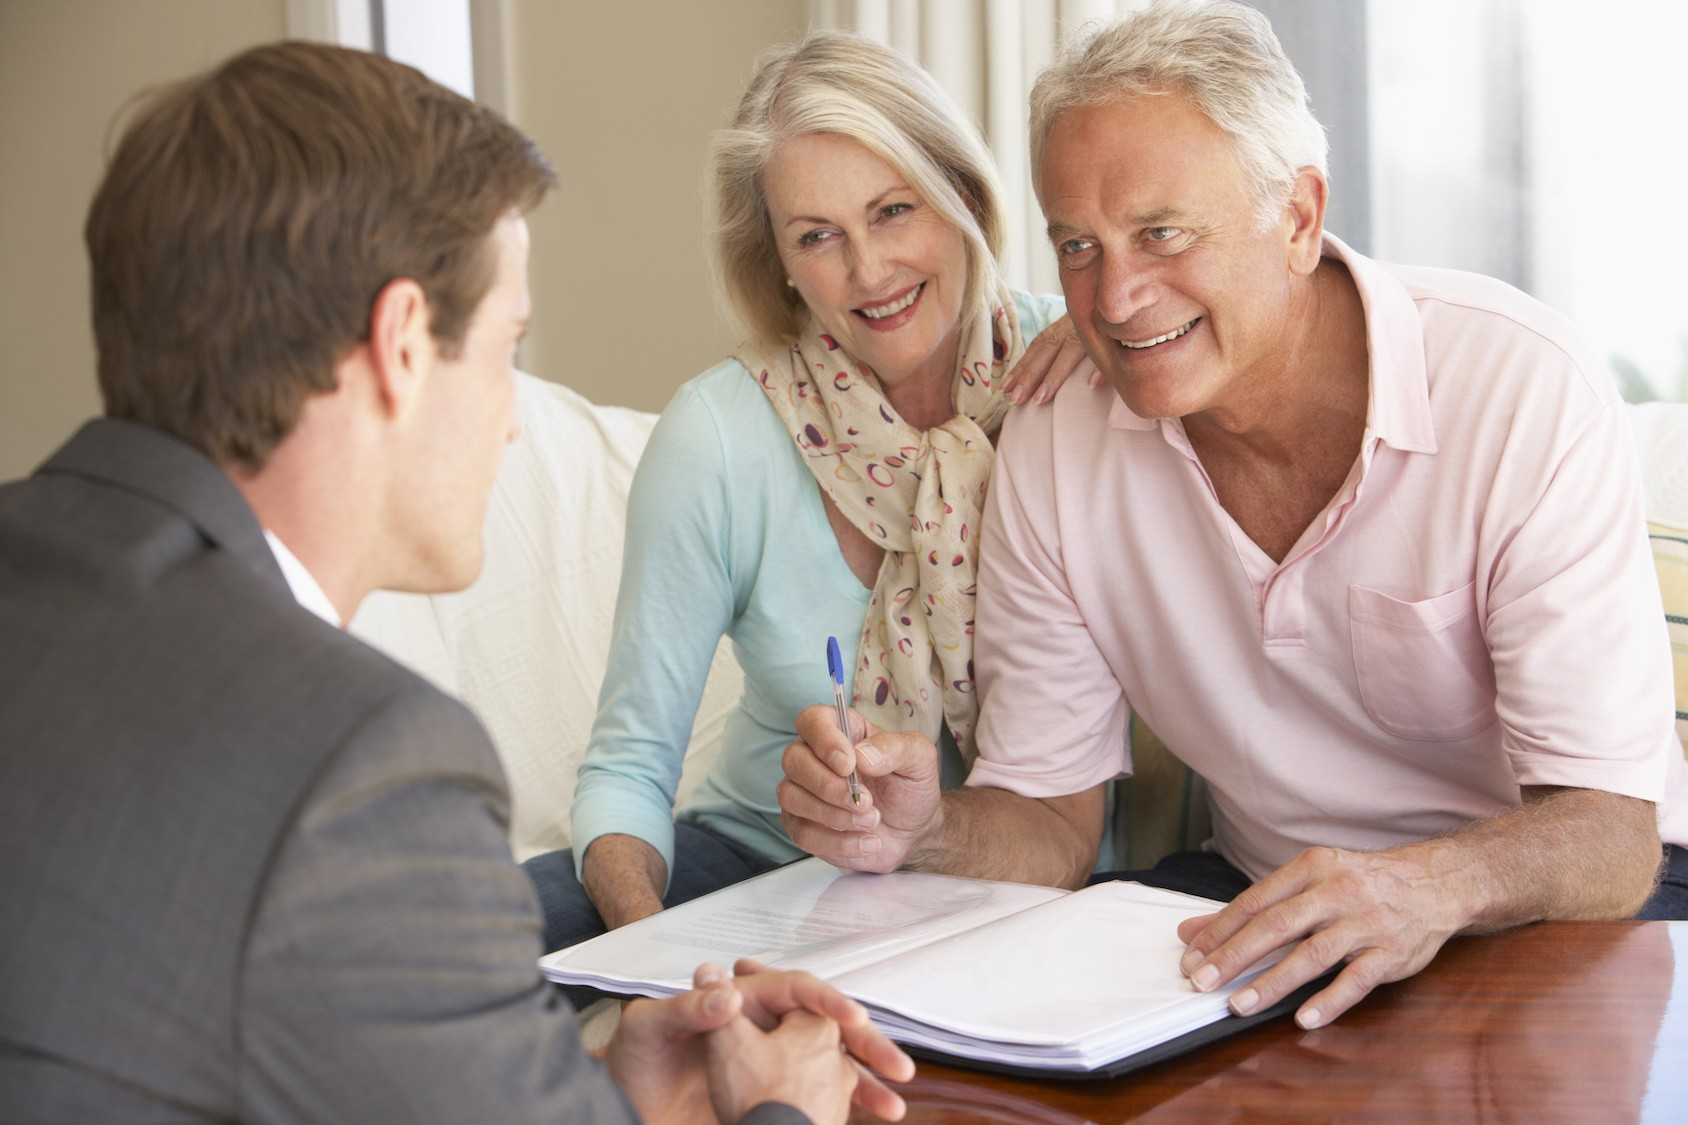 Talking to Your Elderly Parents About Finances